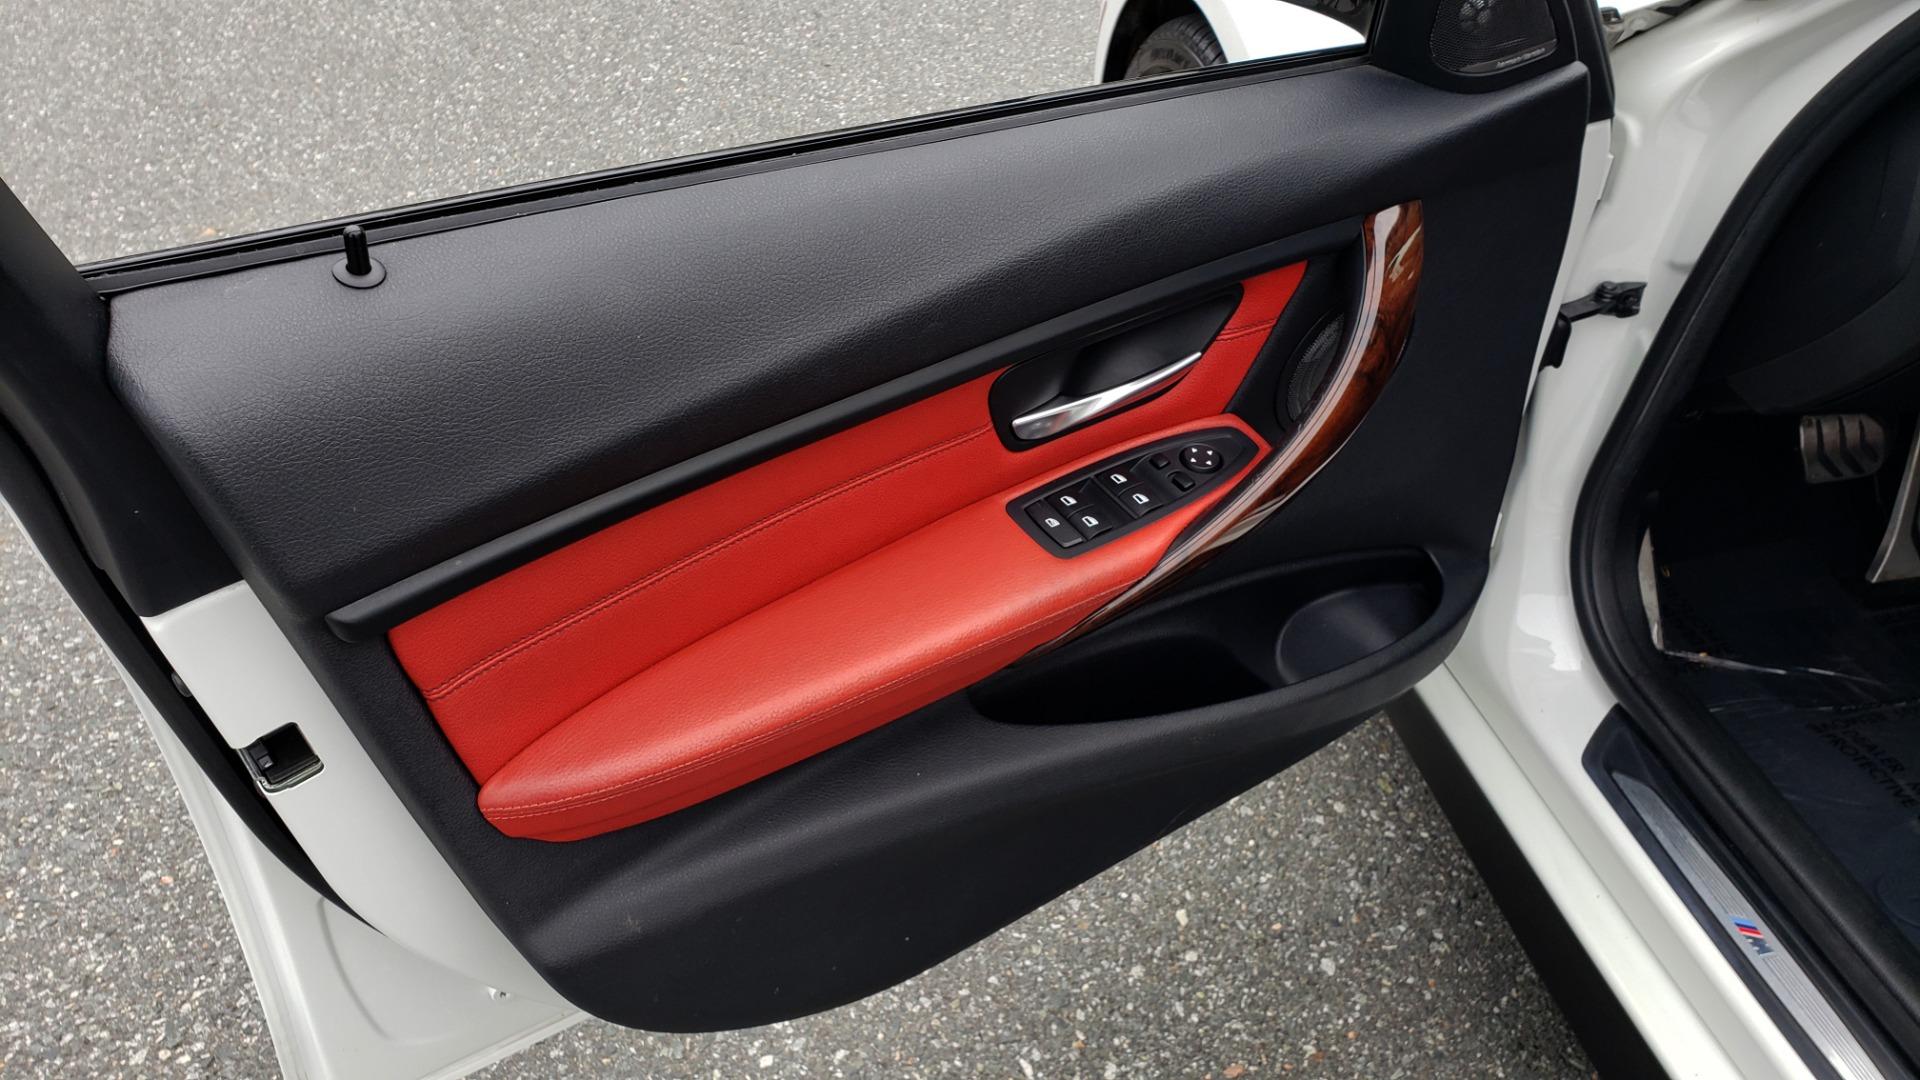 Used 2015 BMW 3 Series 335I M-SPORT / PREM PKG / HK SND / SUNROOF / REARVIEW for sale Sold at Formula Imports in Charlotte NC 28227 32